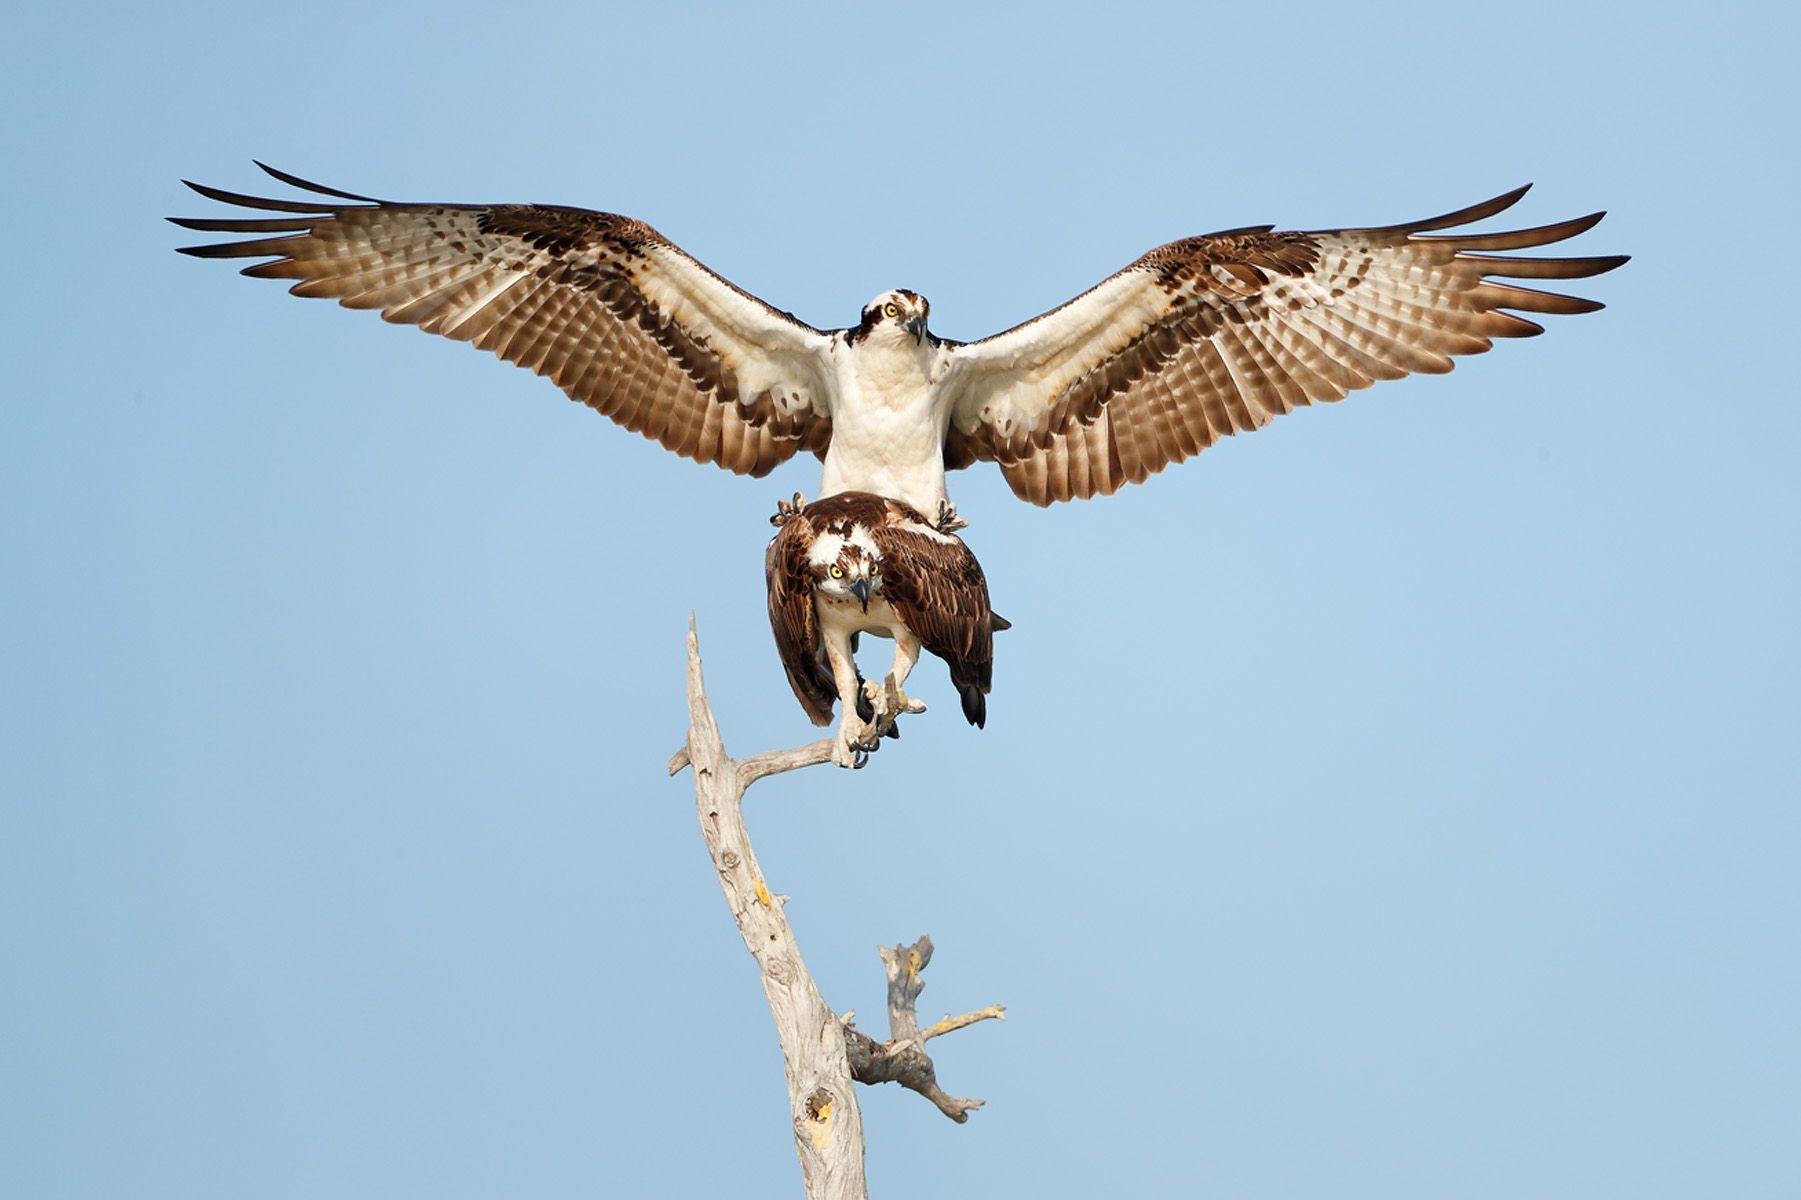 Ospreys courting behavior_A3I4035- Lake Blue Cypress, FL, USA.jpg